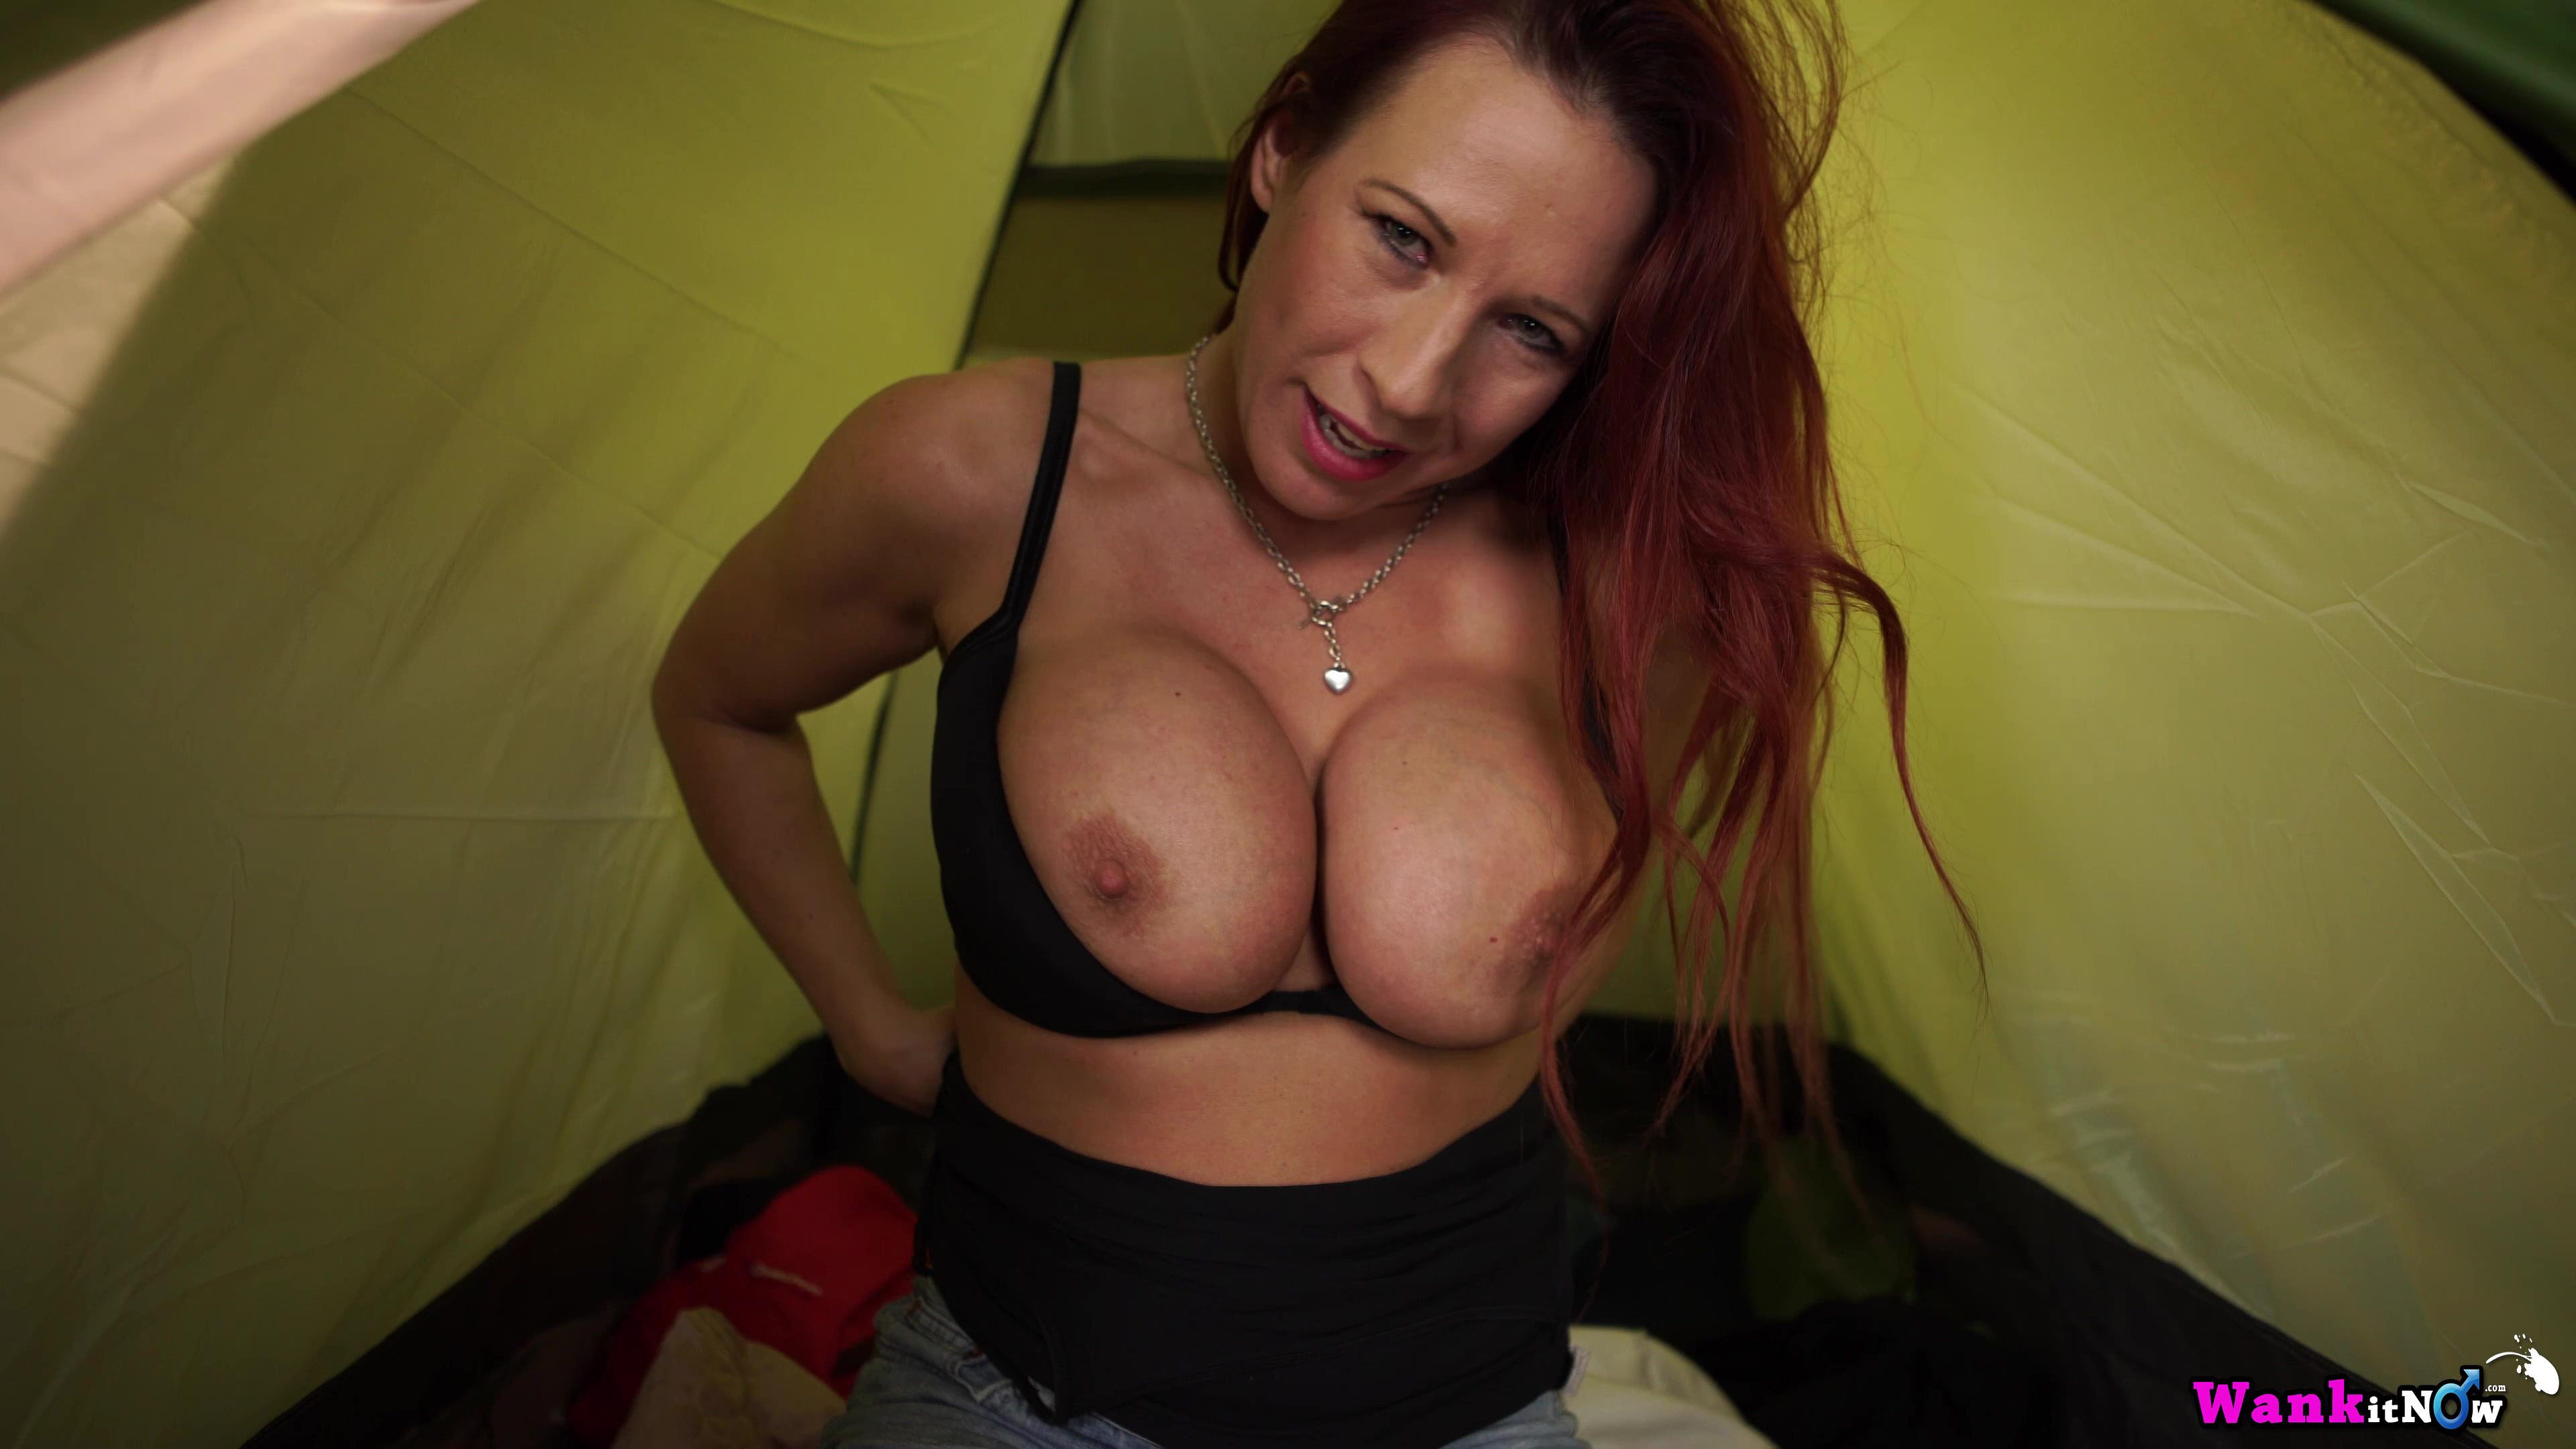 hot mom camping nude